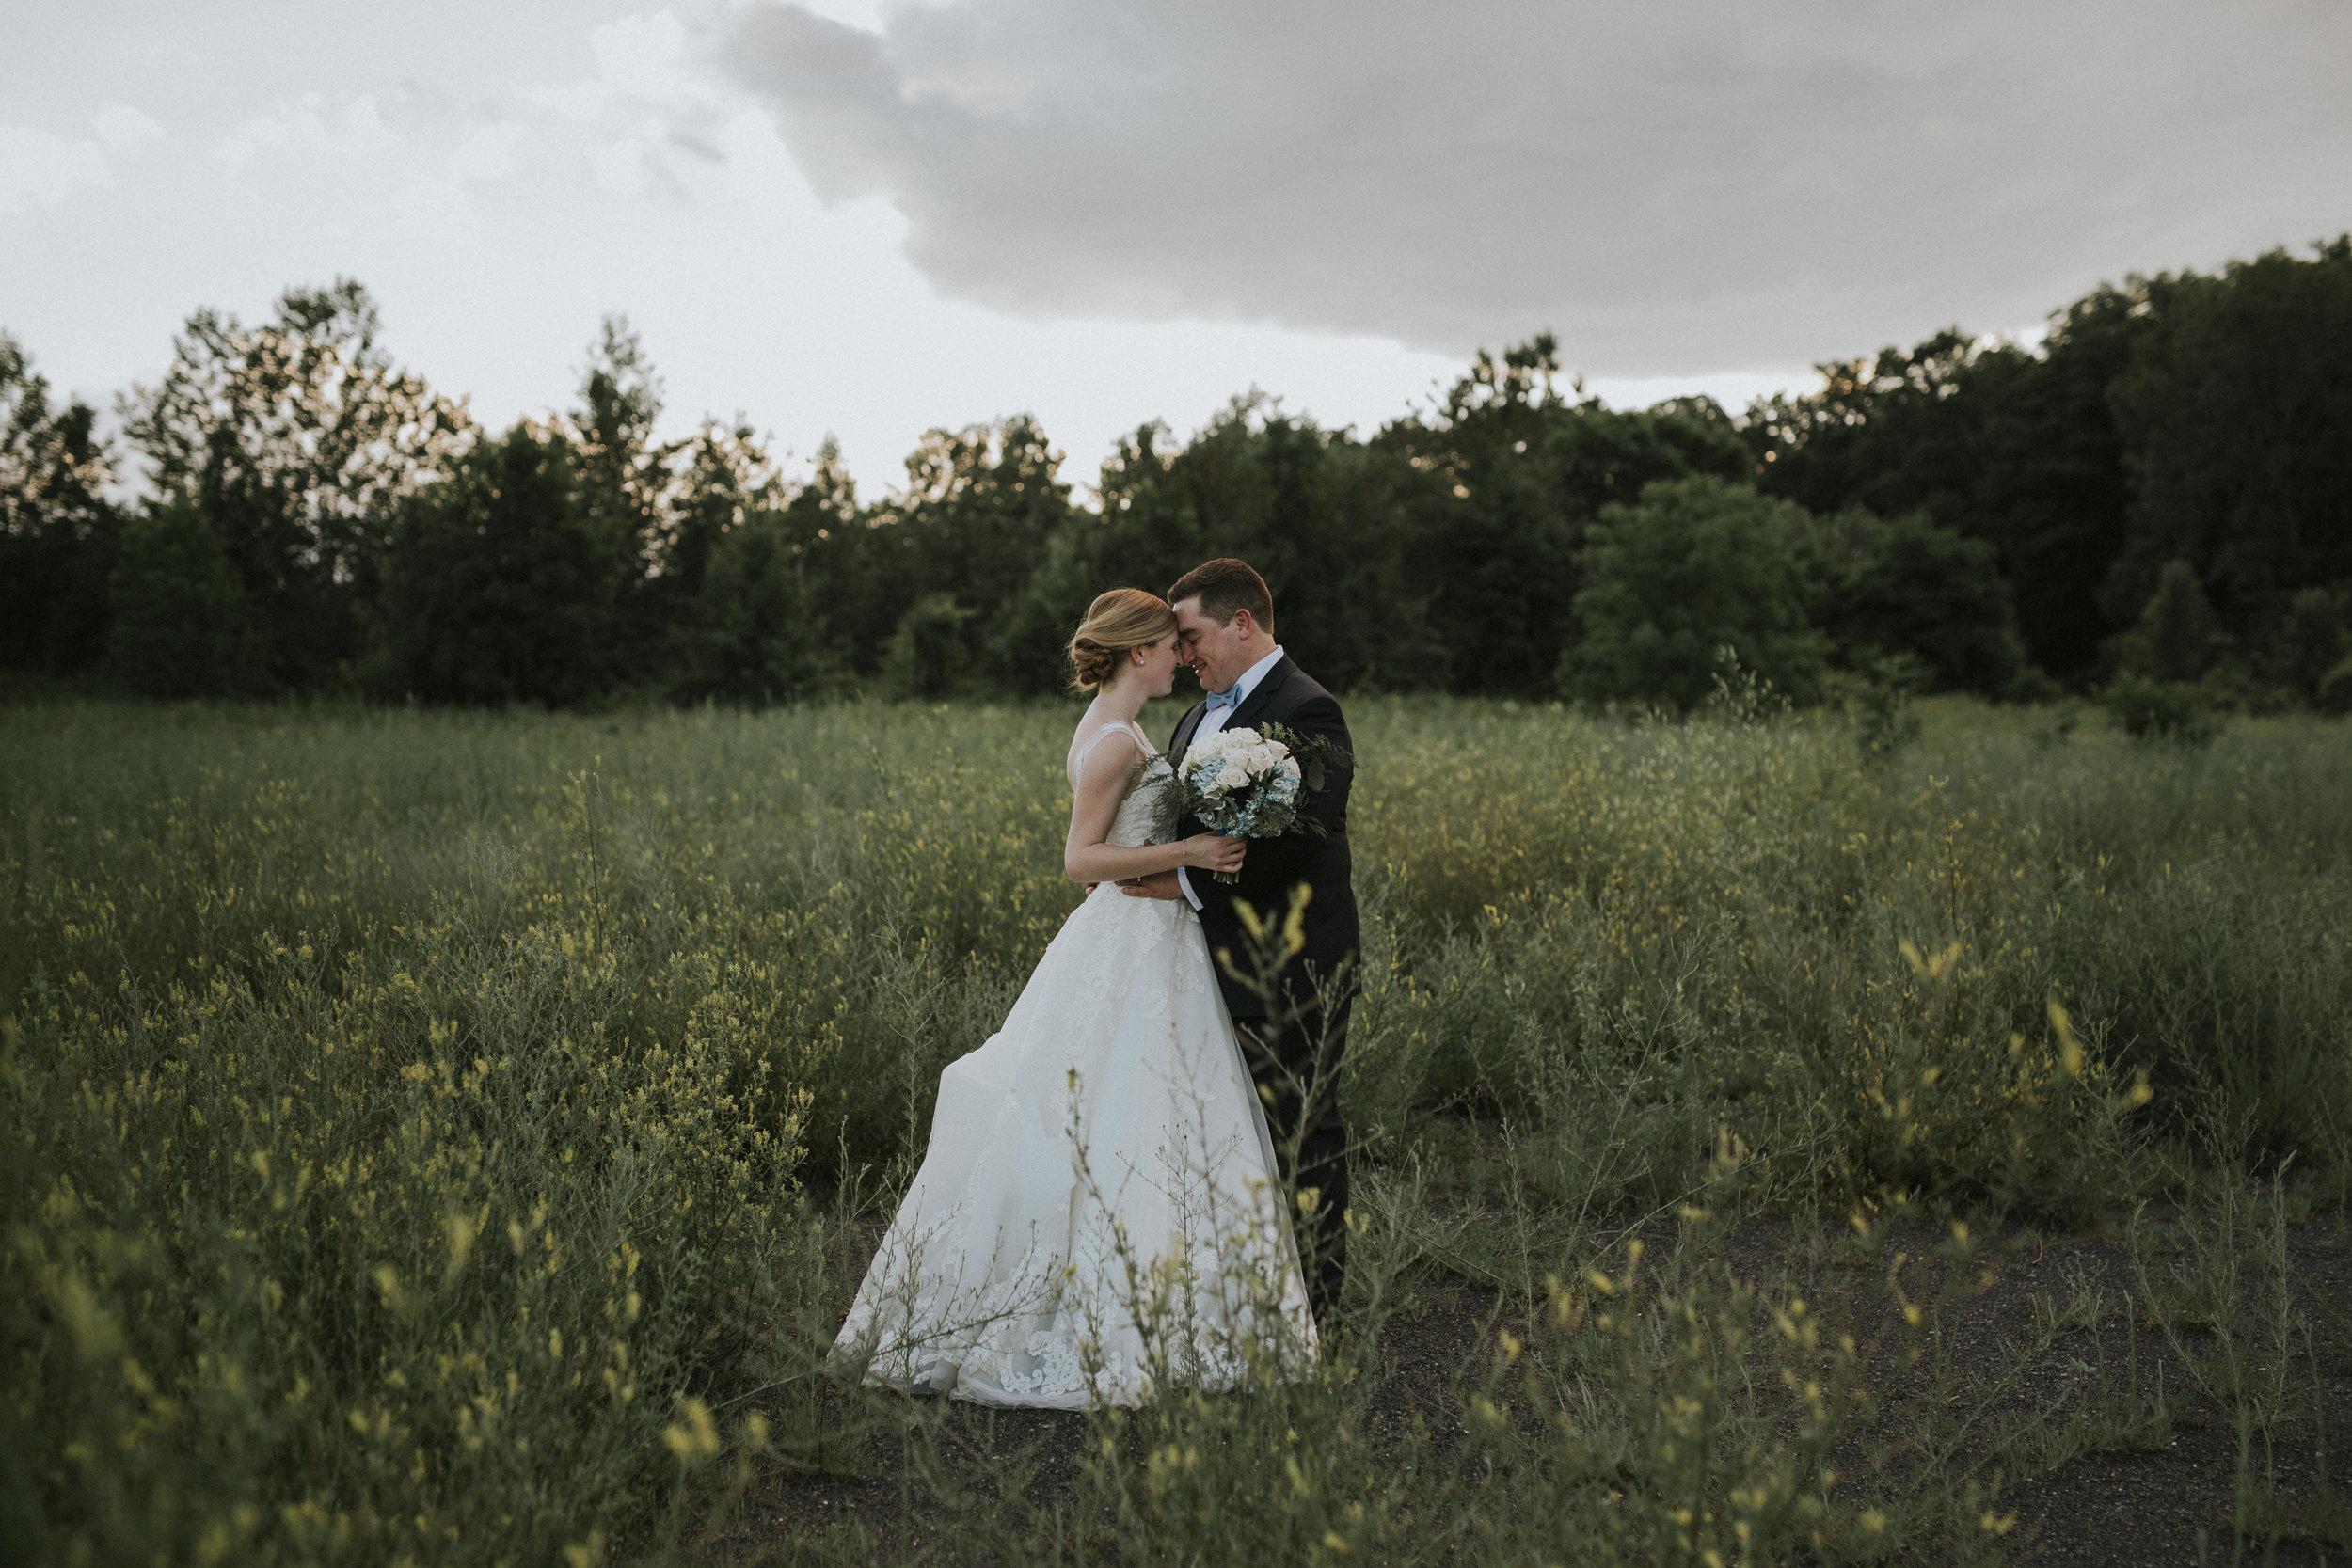 shaker_heritage_wedding_0057.JPG